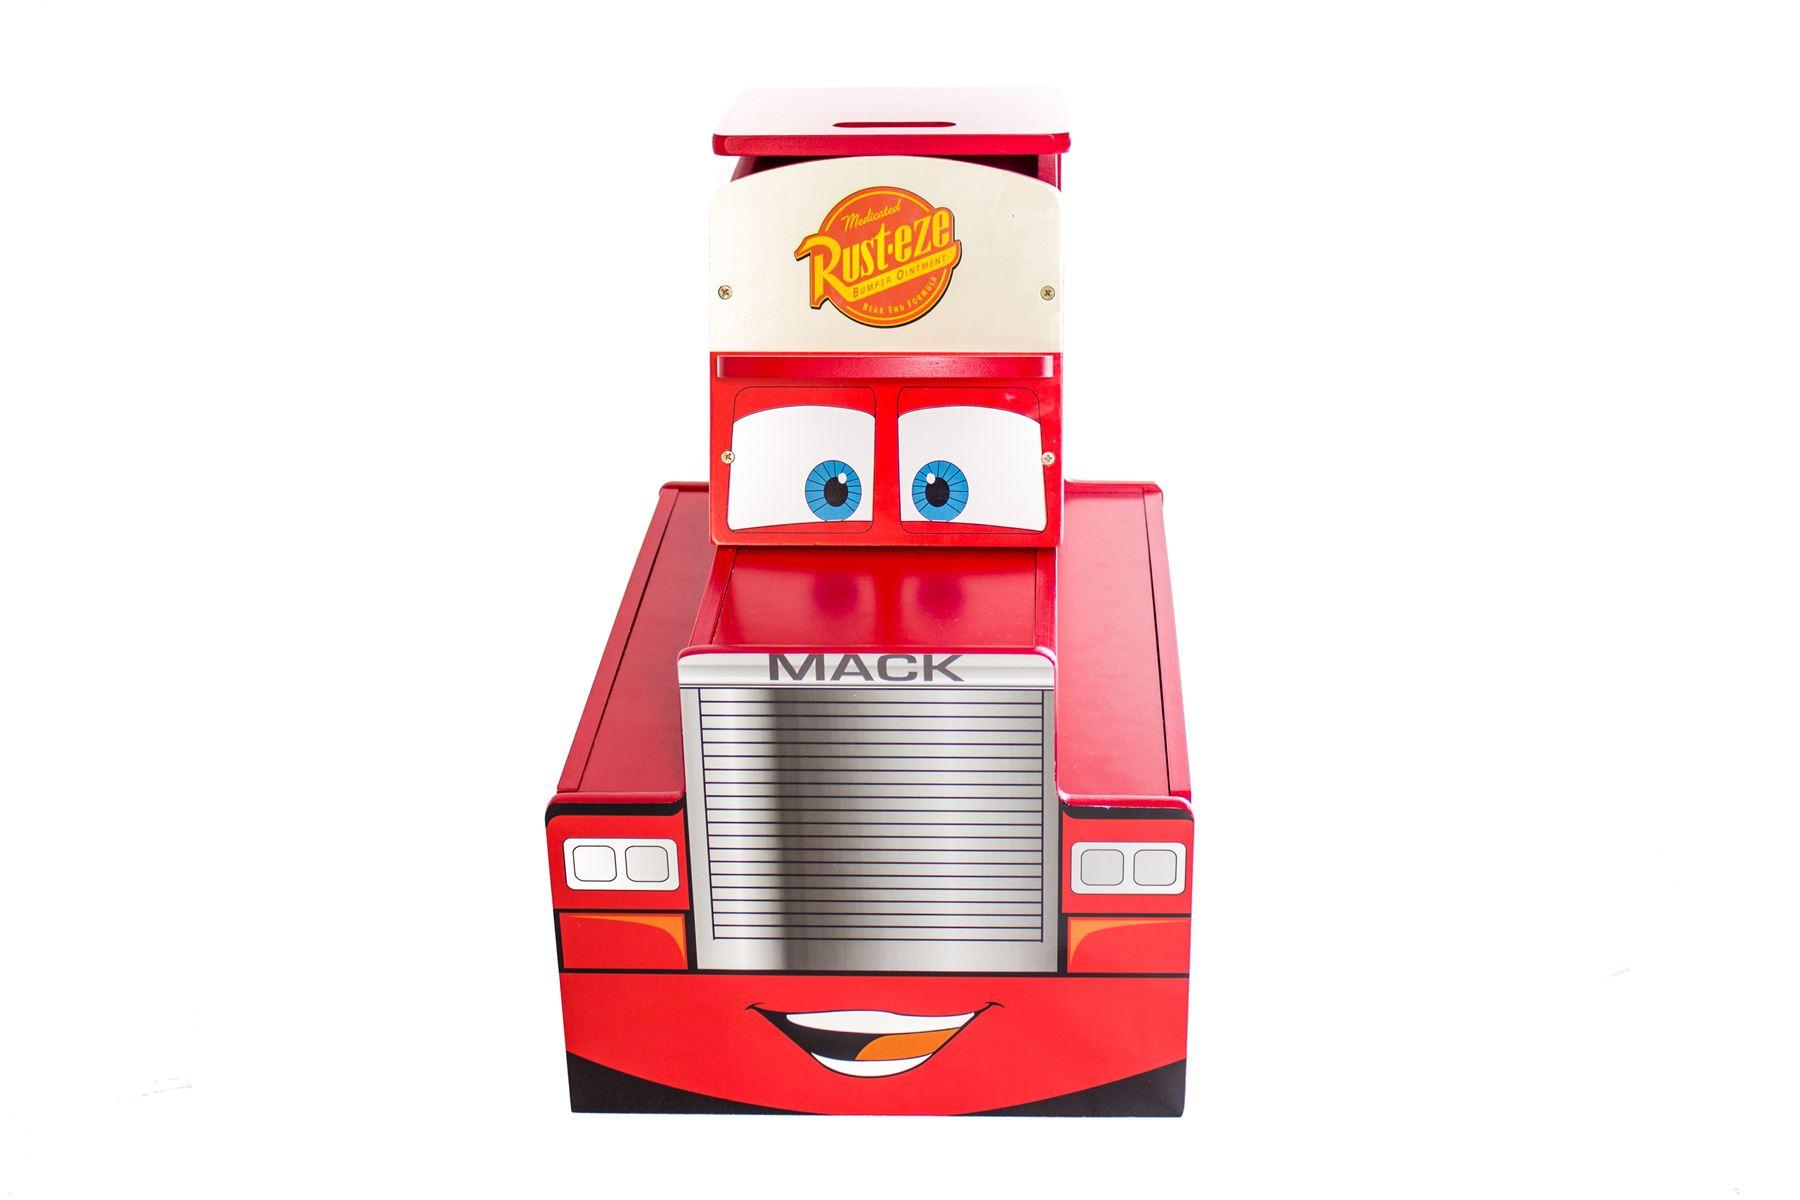 Kids Storage Bench Furniture Toy Box Bedroom Playroom: Disney Kids Cars Bench Childrens Toy Storage Kids Bedroom